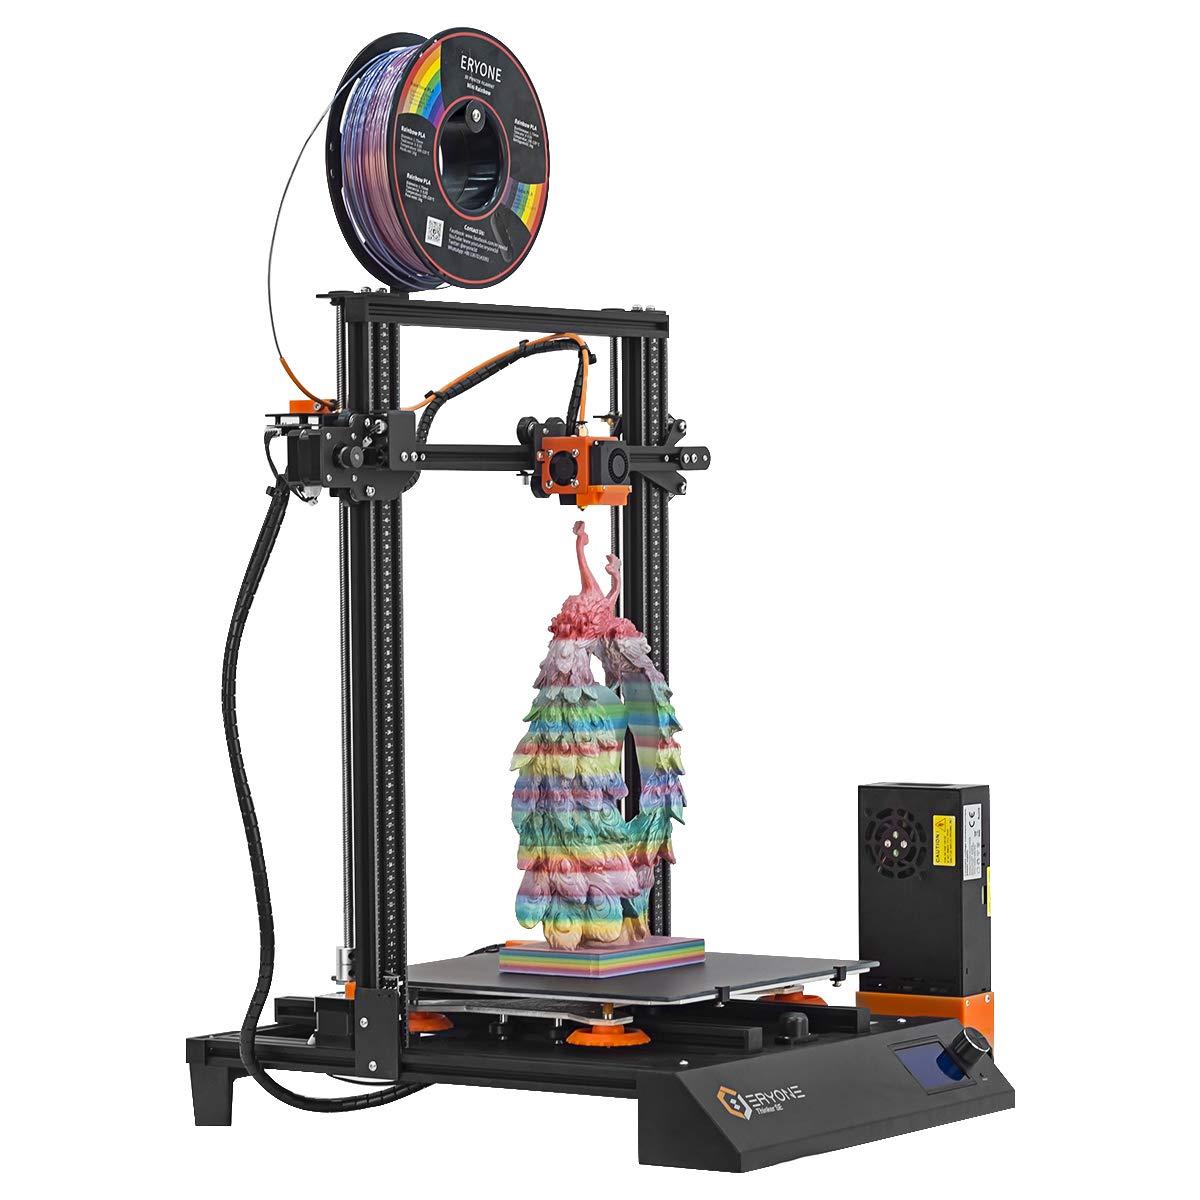 Magn/ética y Flexible Tama/ño de Impresi/ón 300x300x400 mm Extrusora y Plataforma de Impresi/ón Superficie de Impresi/ón PEI S/úper Silenciosa Eje XYZ Mejorado Impresora 3D Eryone Thinker S